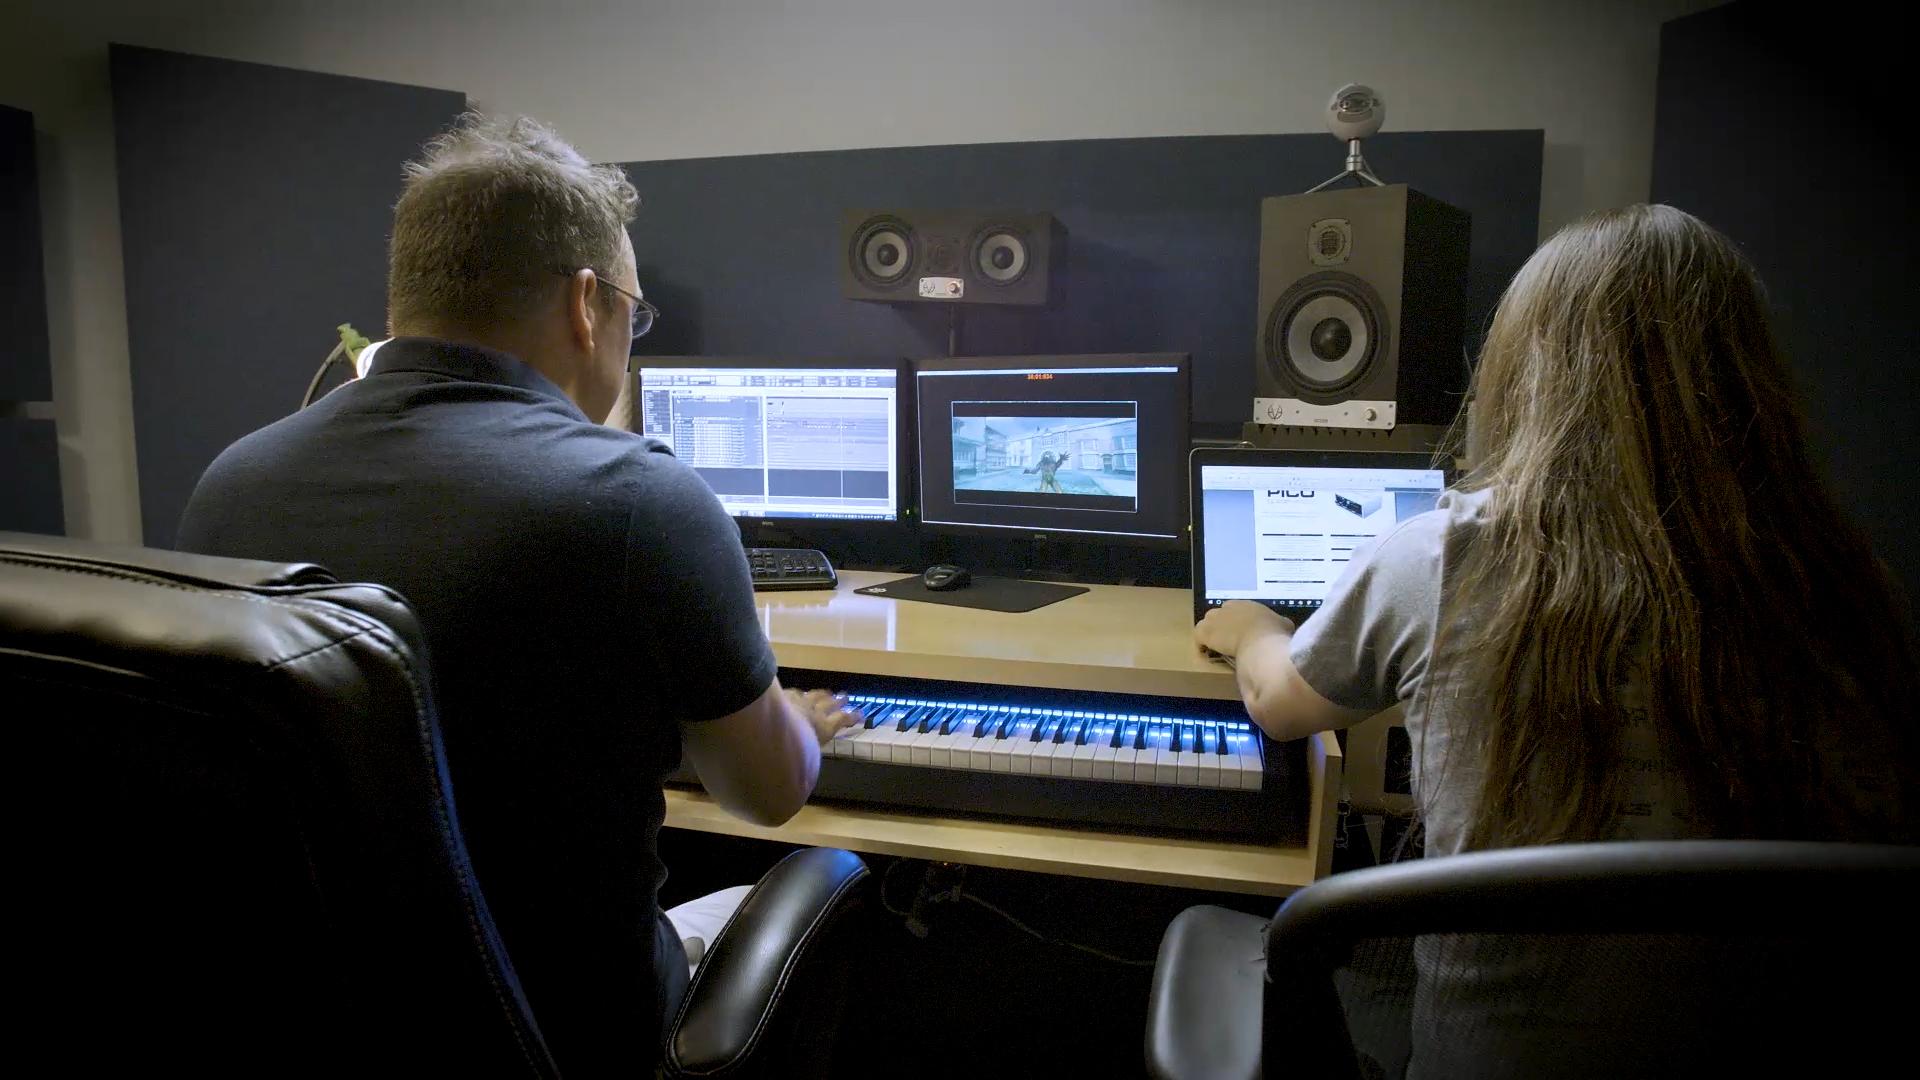 Junior composer/sound designer